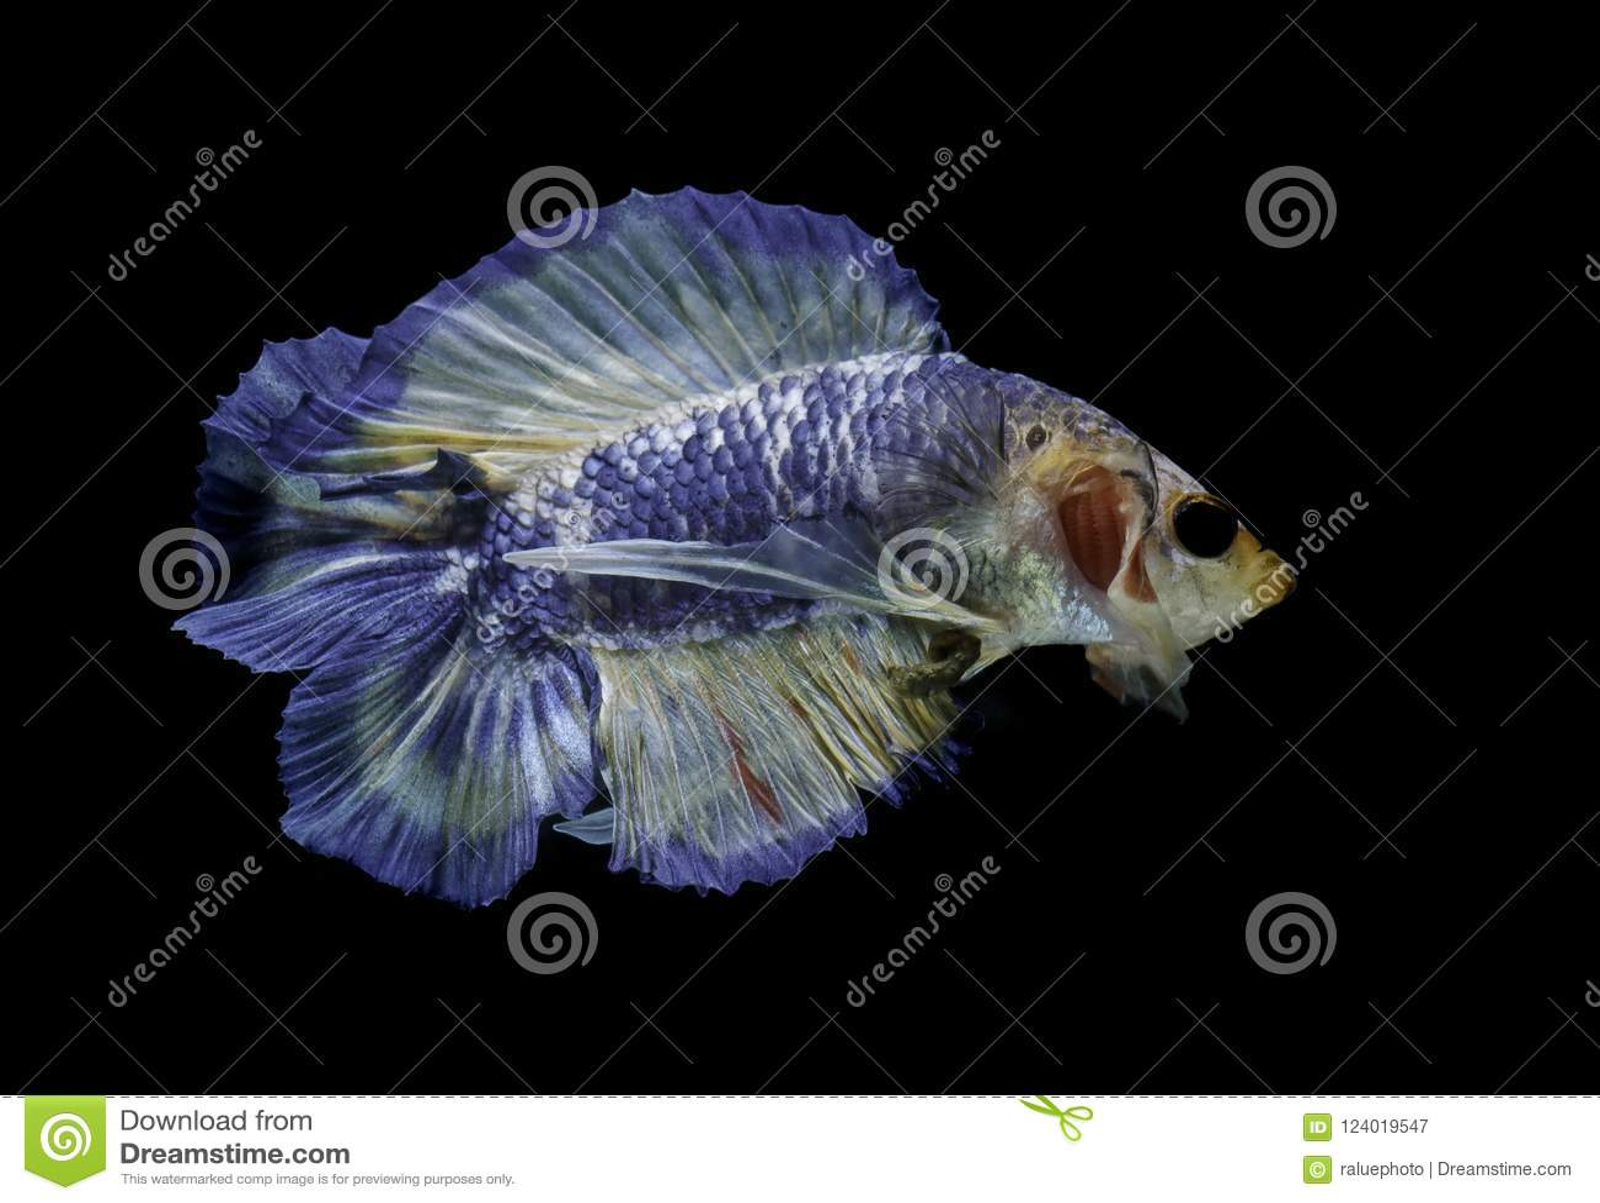 Siamese Fighting Fish Fight Blue Fish Betta Splendens Betta Fish